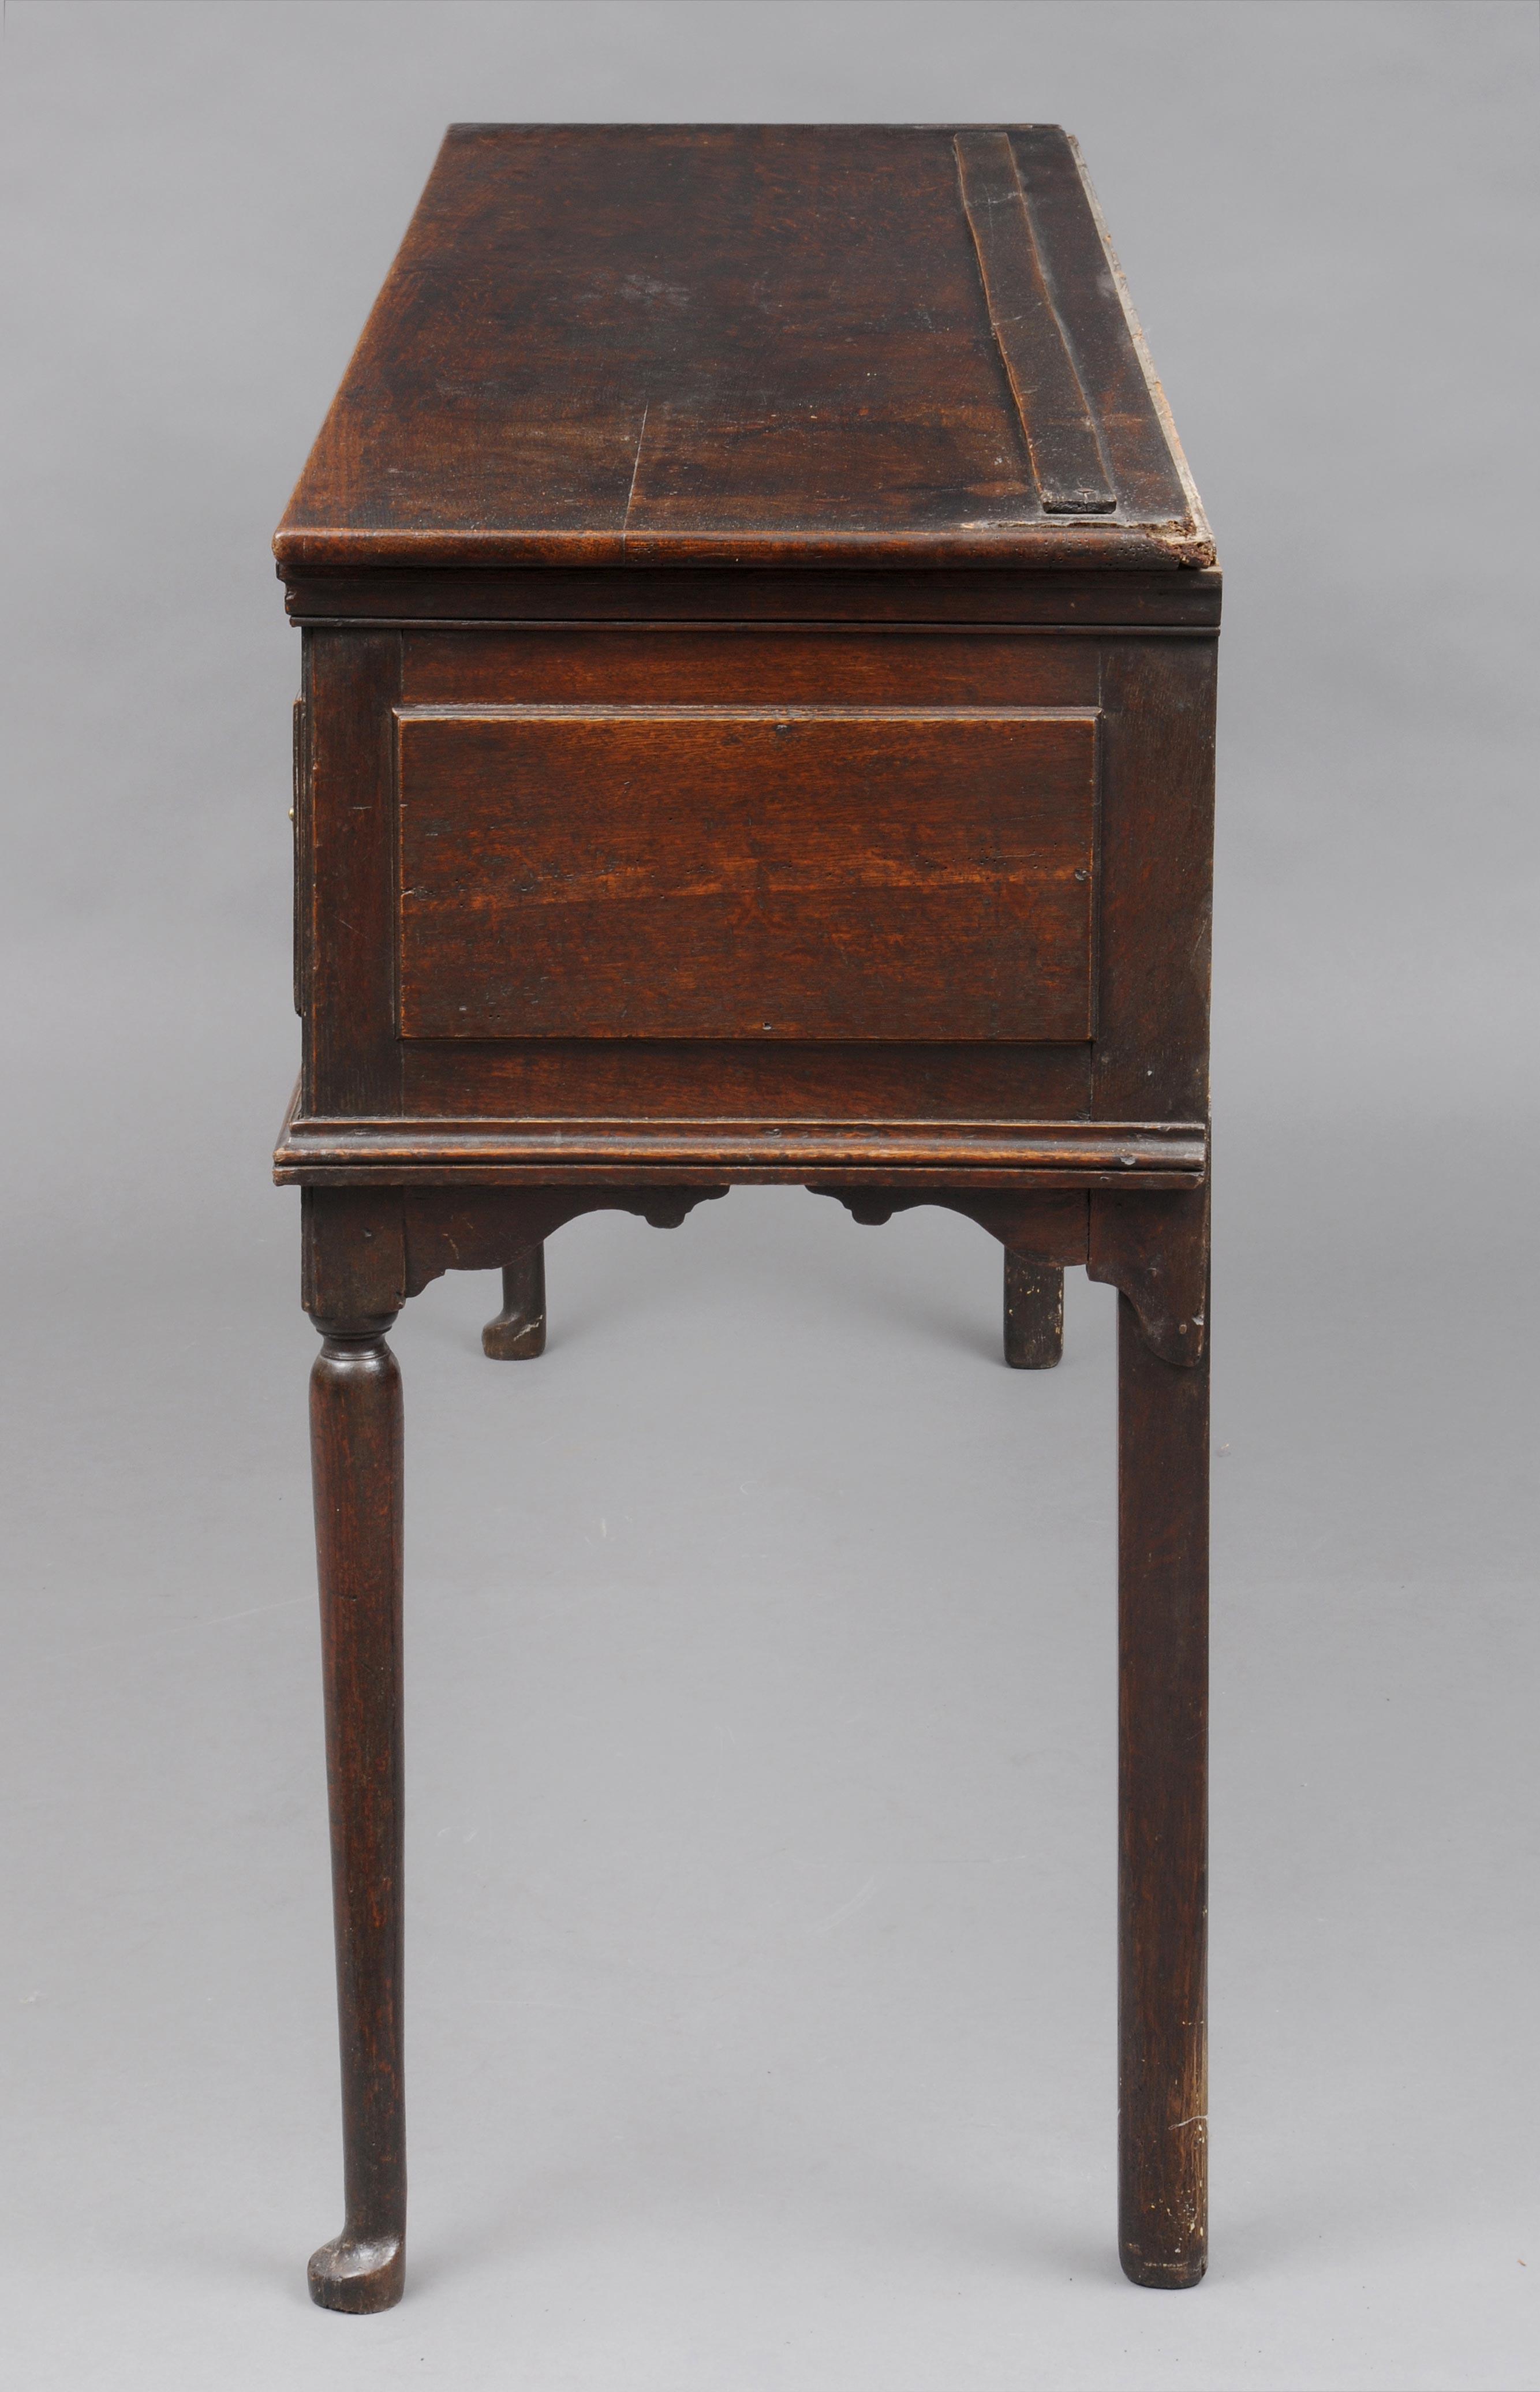 ... English Georgian Sussex Oak Dresser and Plate Rack 18th Century ... & English Georgian Sussex Antique Oak Dresser u0026 Plate Rack